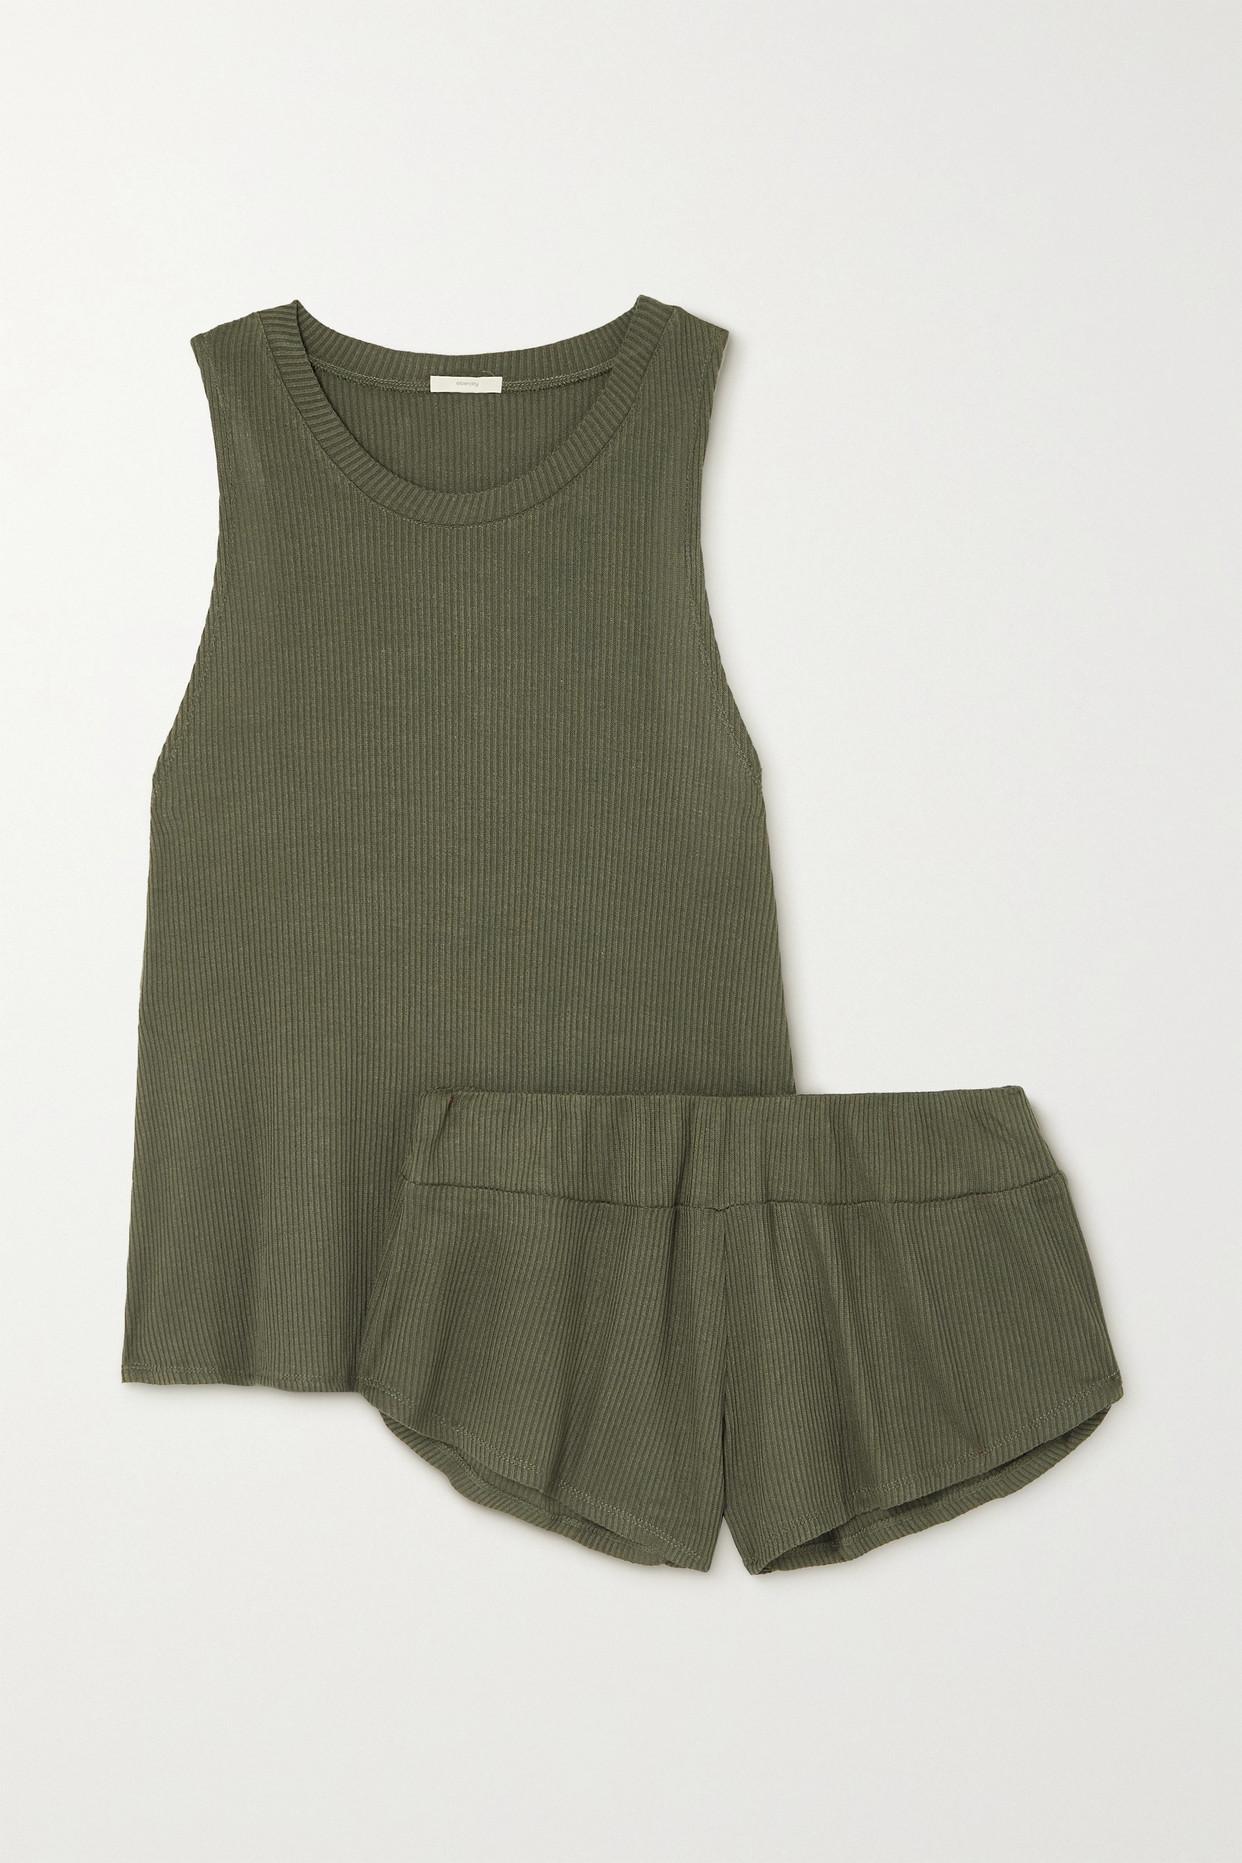 EBERJEY - Elon Ribbed Jersey Pajama Set - Green - small